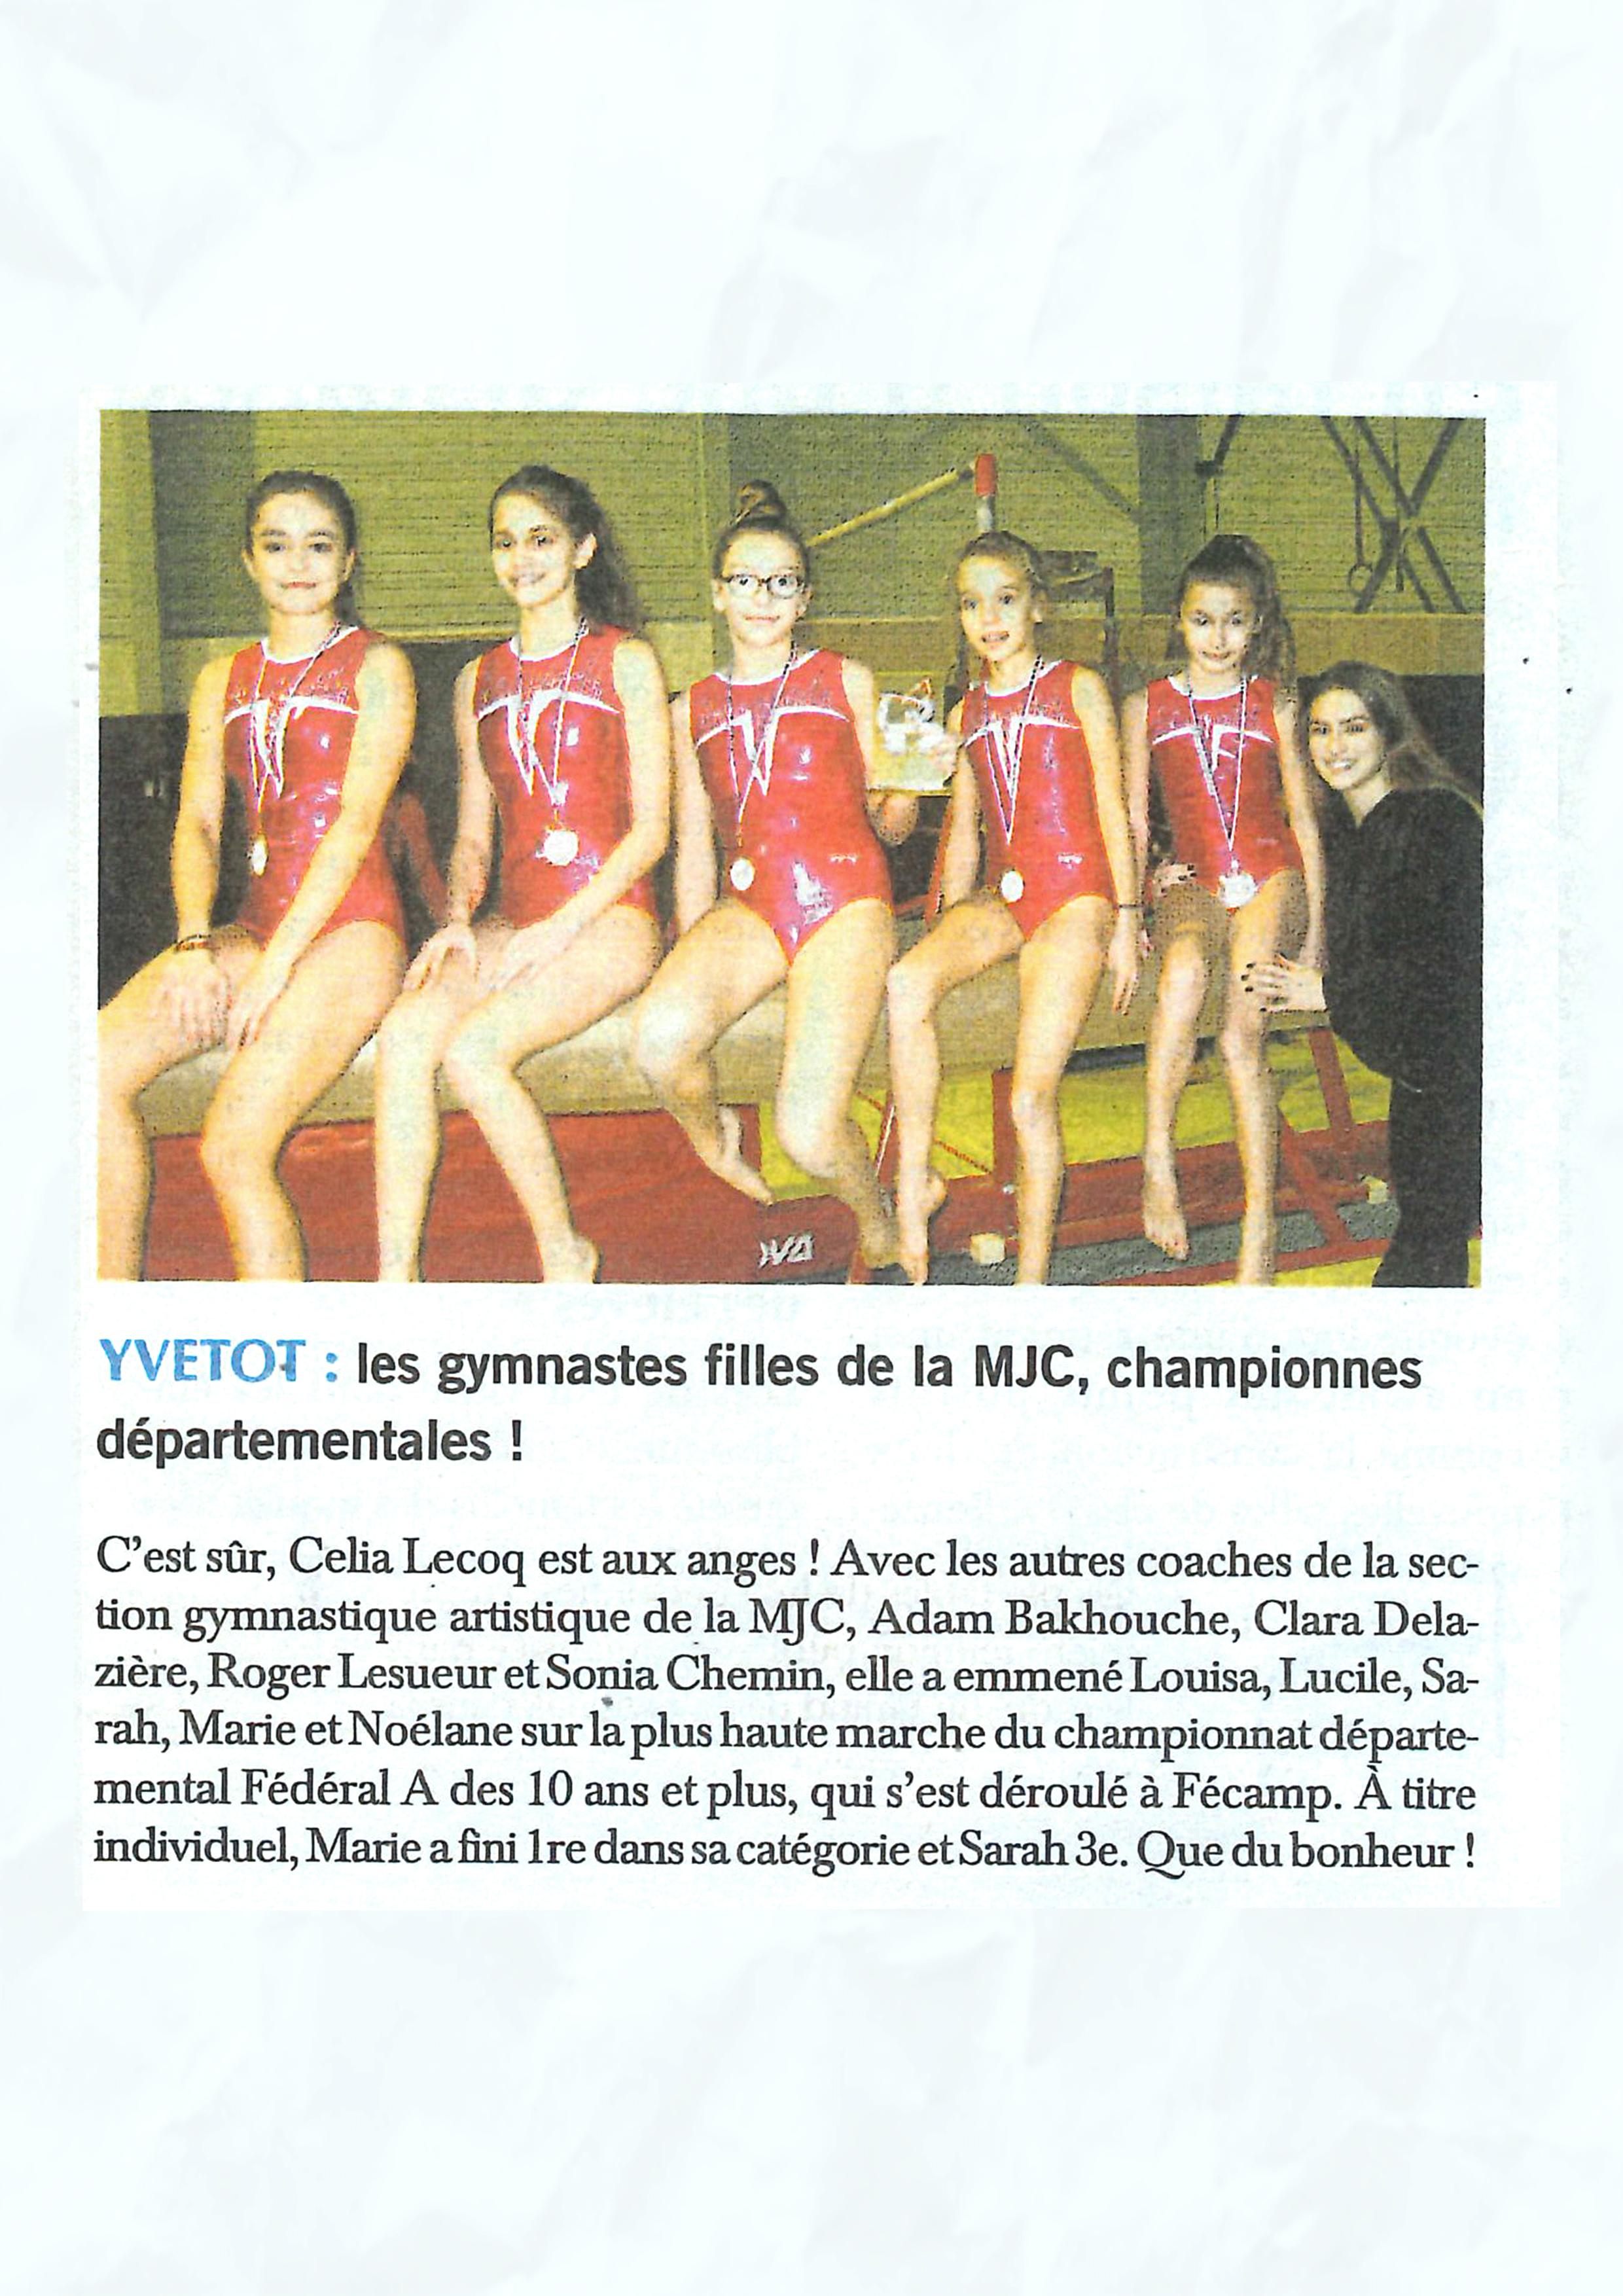 Gymnastique_Paris_NJormandie_Journal